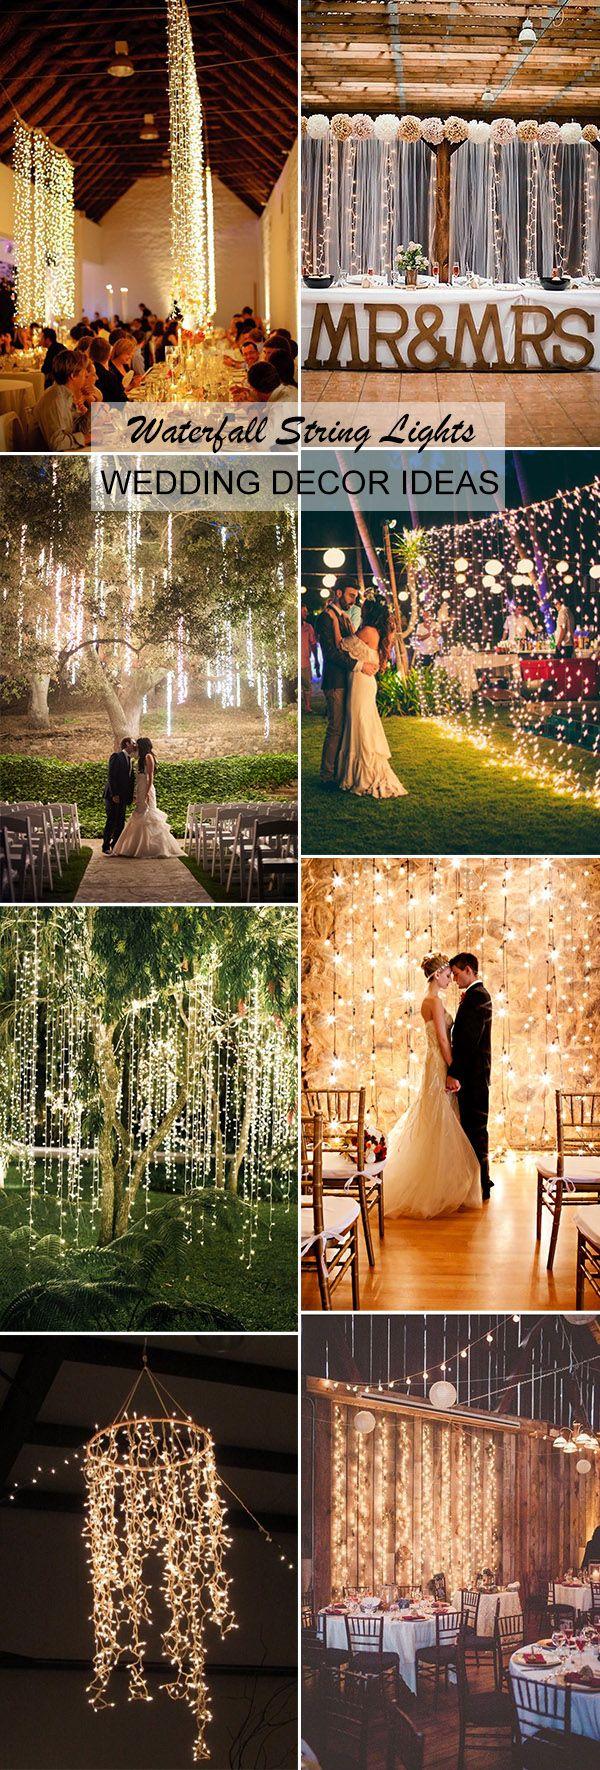 The 141 best images on pinterest wedding decoration 30 stunning and creative string lights wedding decor ideas junglespirit Gallery